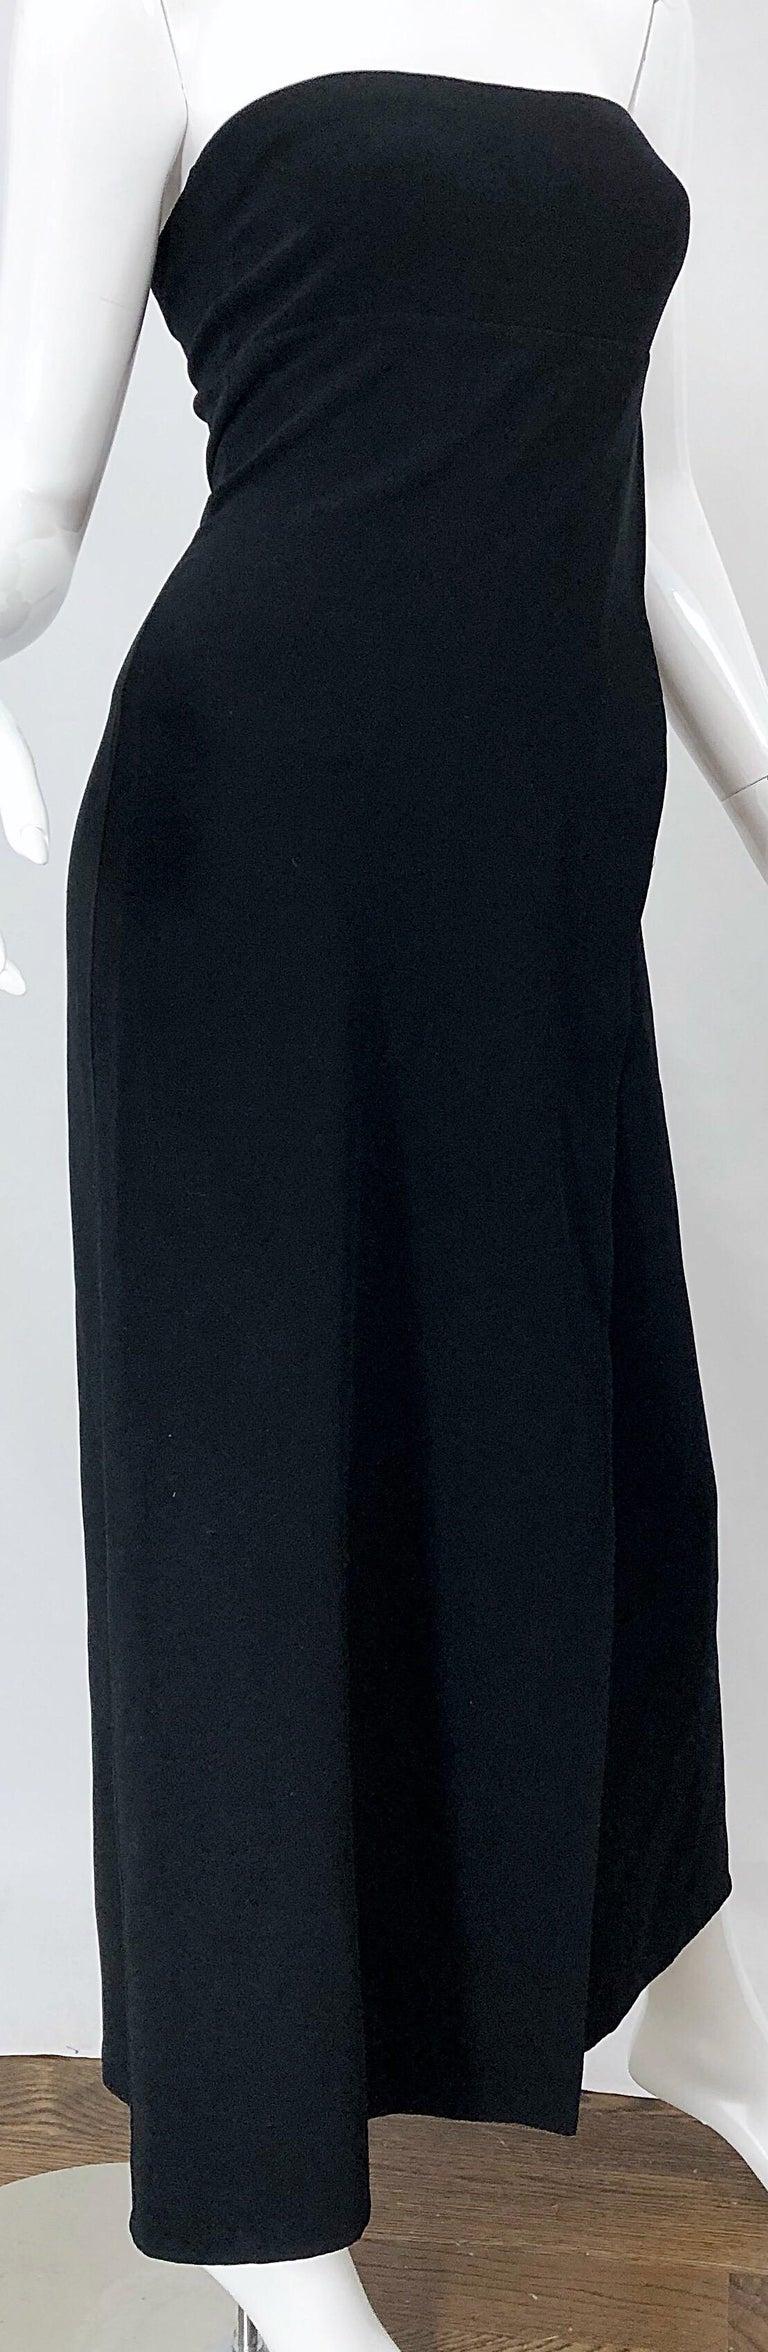 1990s Donna Karan New York Size 4 Black Strapless Vintage 90s Gown Maxi Dress For Sale 1